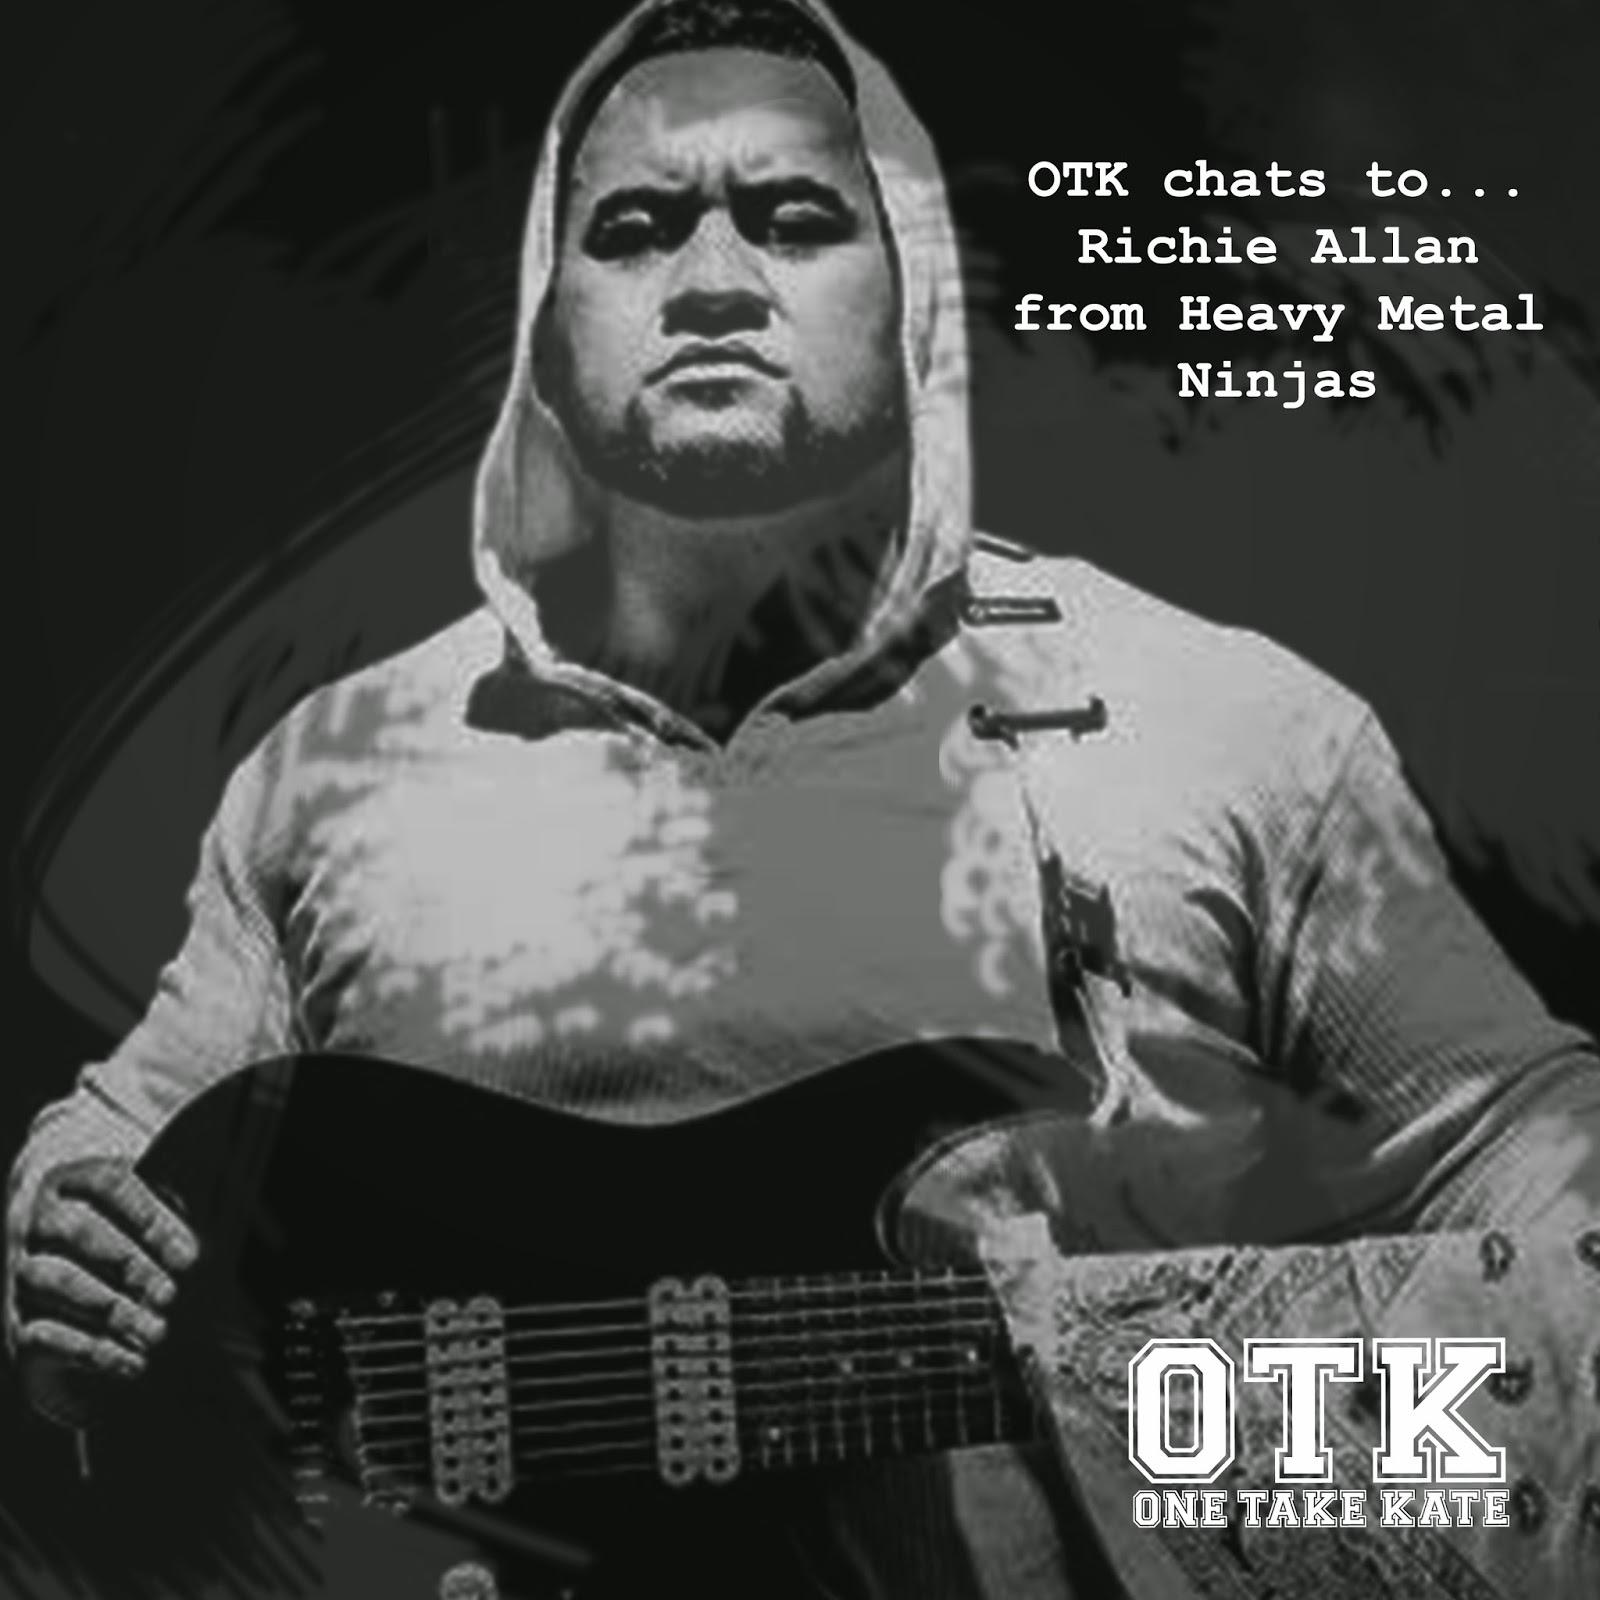 Heavy Metal Ninjas: Richie Allan Interview  - One Take Kate